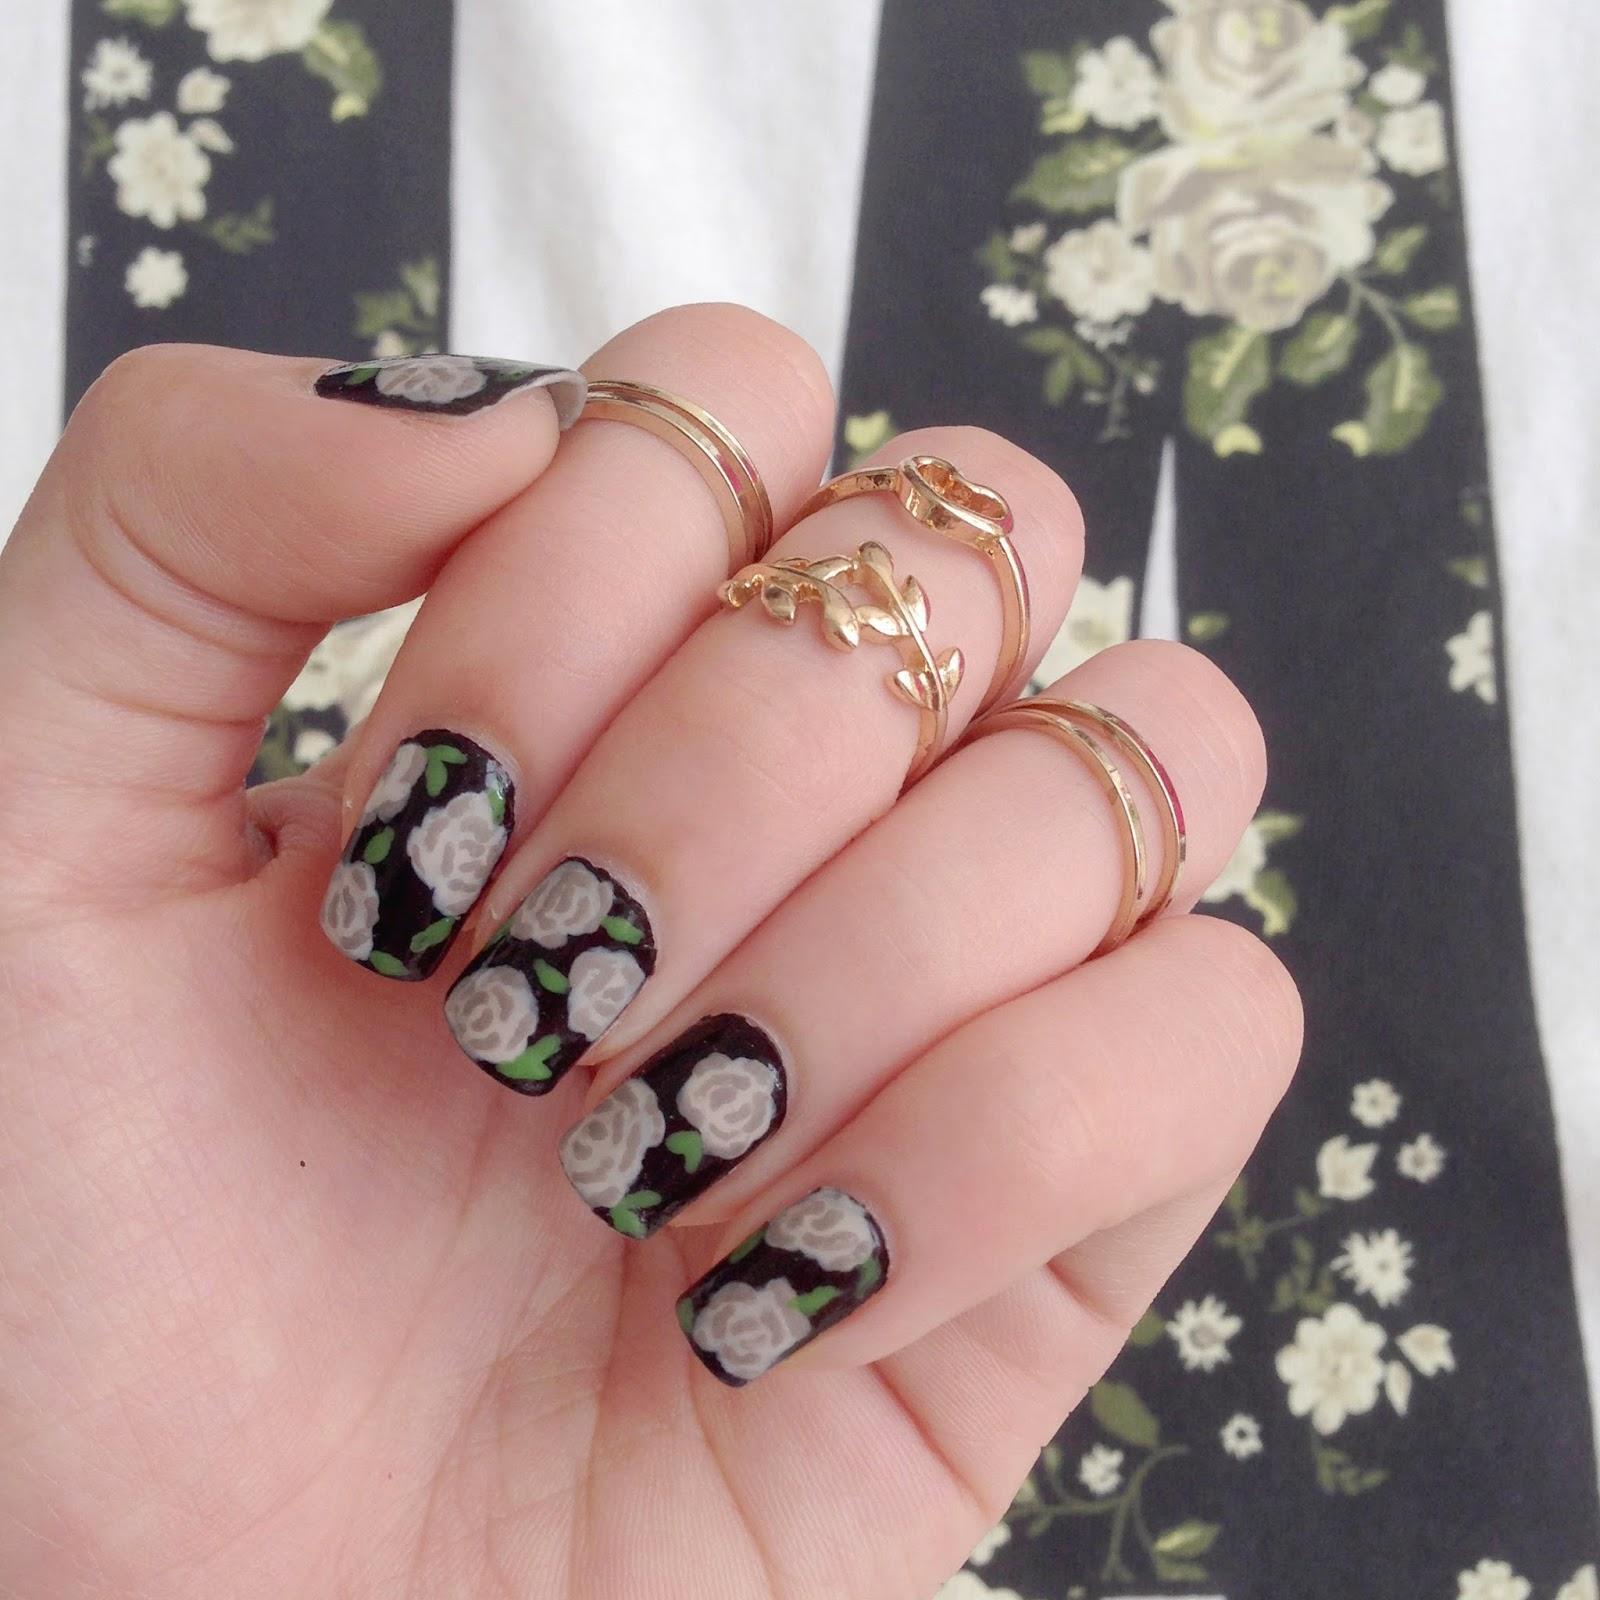 Megoosta Fashion: nail art: grey roses